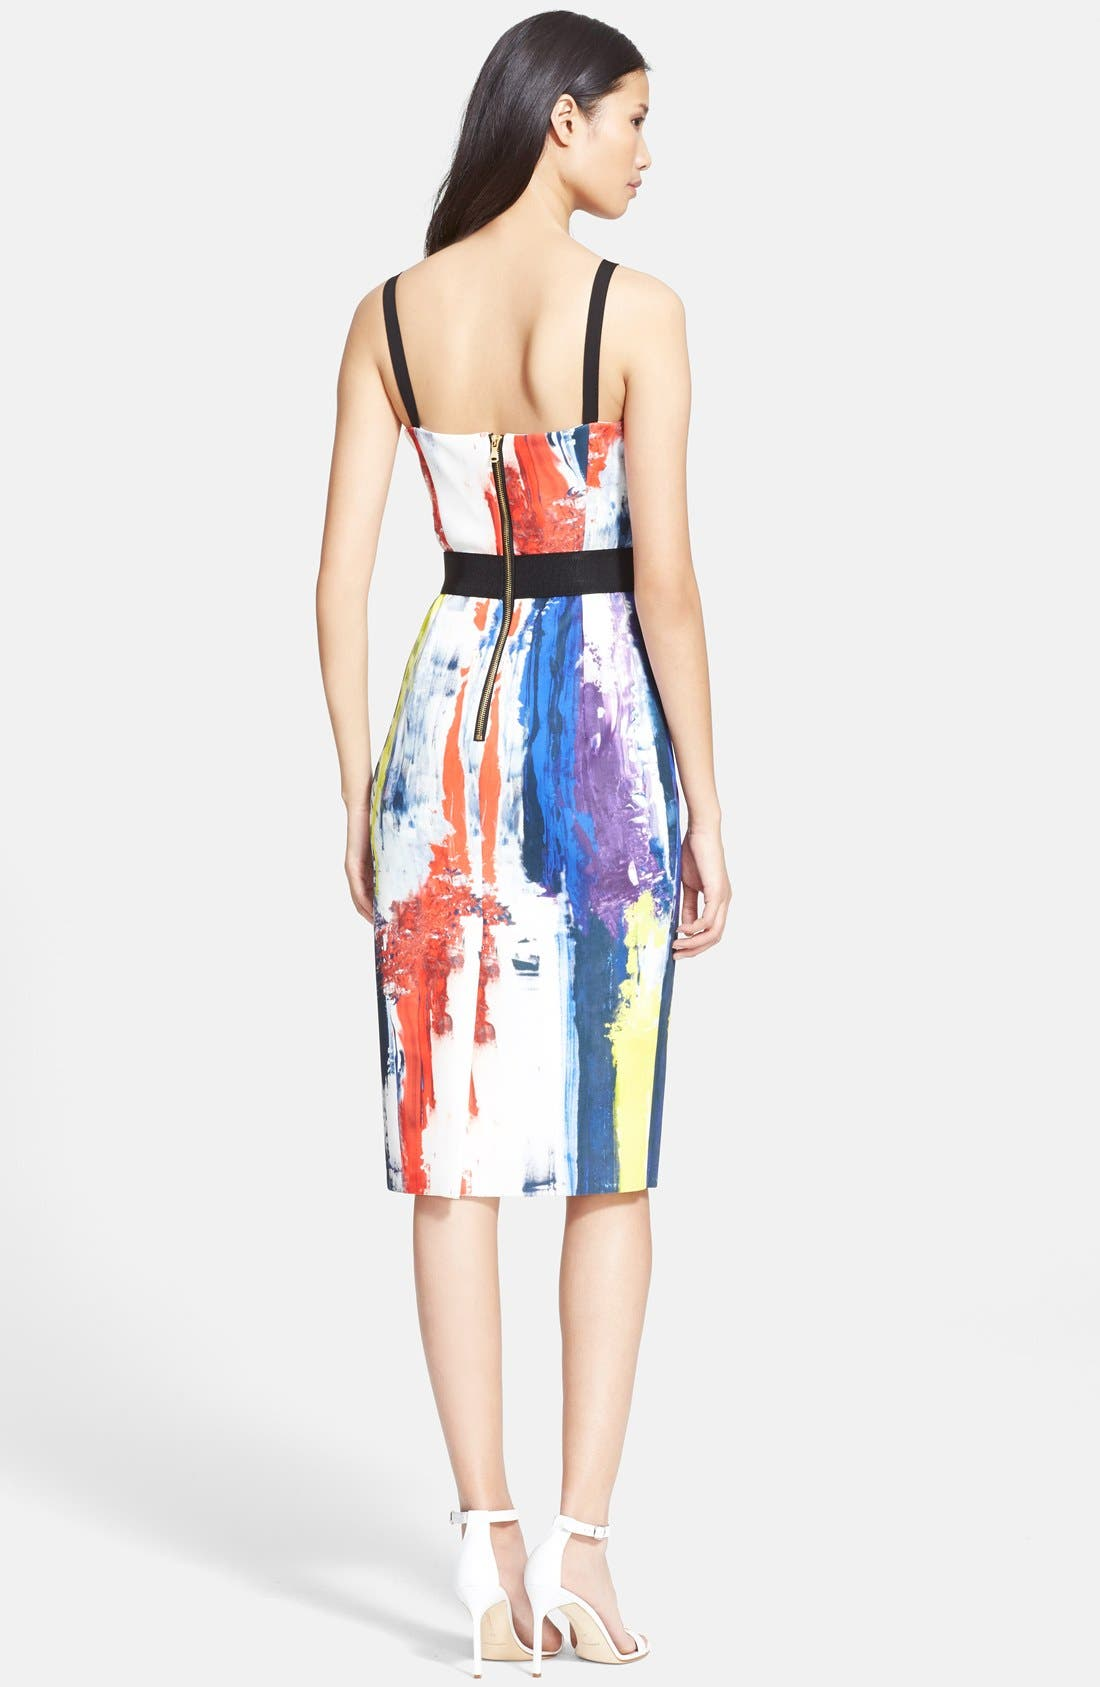 Graffiti Print Bustier Dress,                             Alternate thumbnail 3, color,                             464